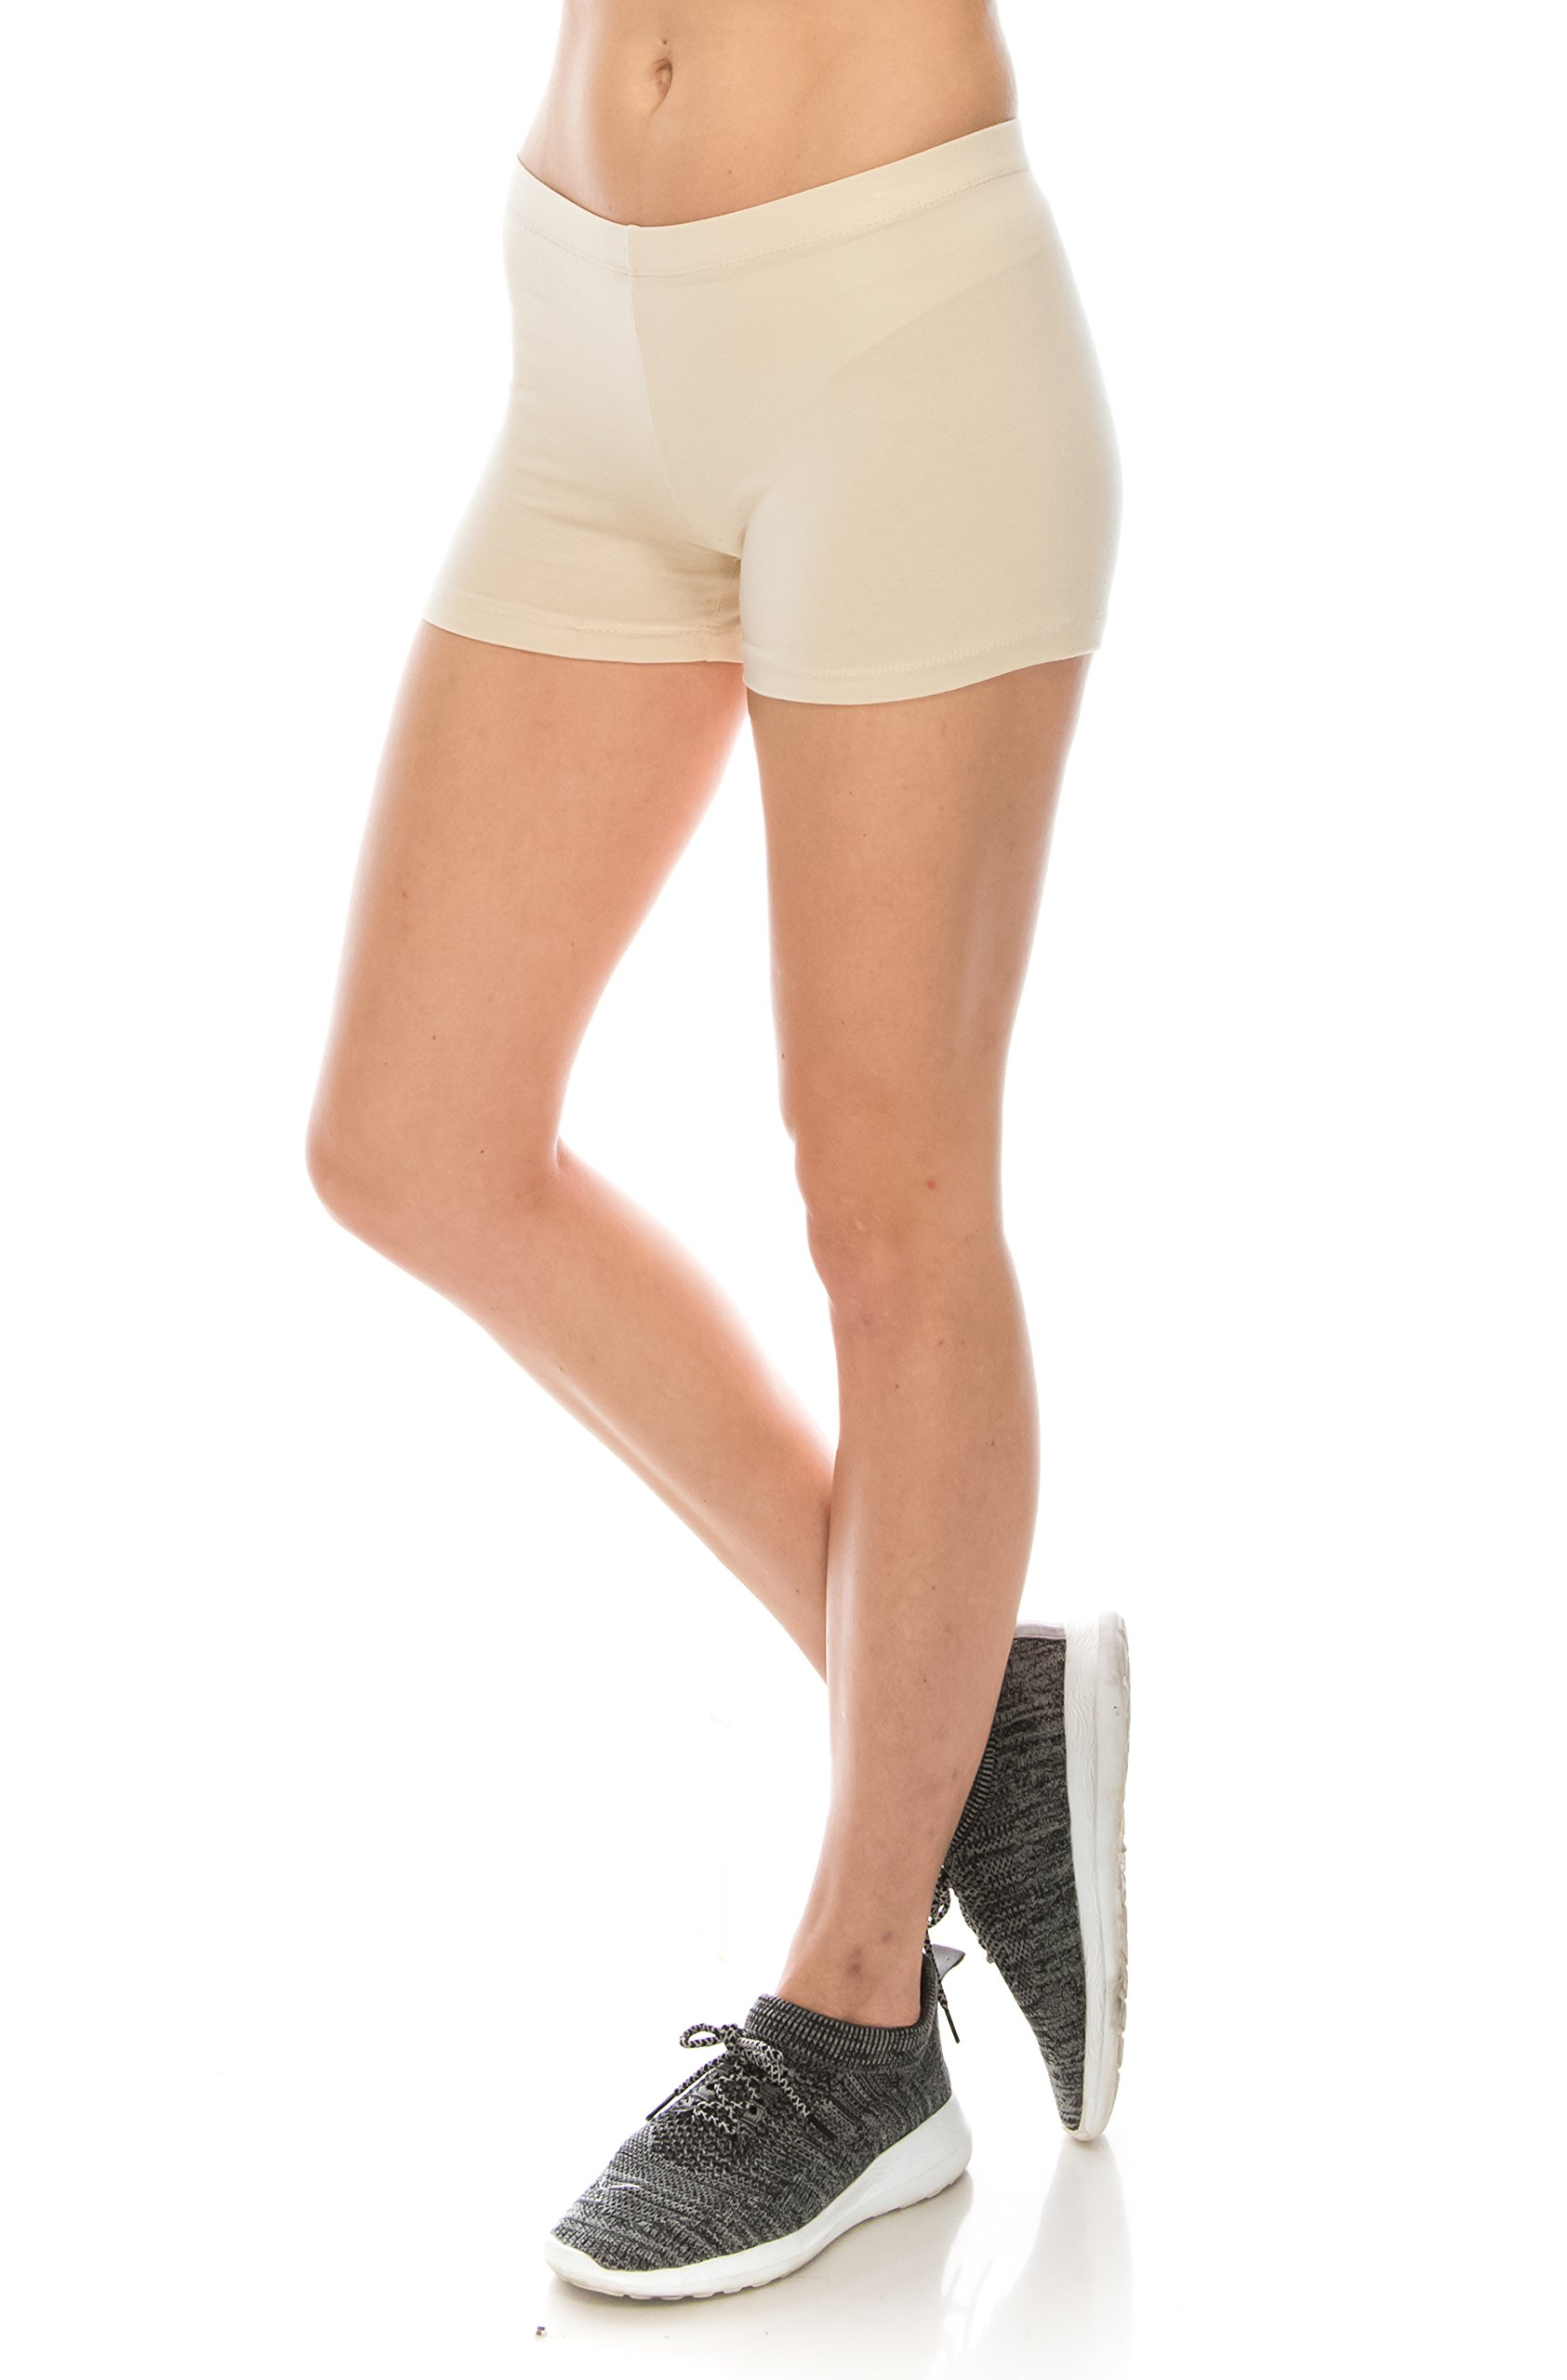 CNC STYLE Women's Regular/Plus Soild Stretch Mini Dance Yoga Workout Underskirt Pant Cotton Booty Shorts Leggings Underwear (Small, Nude)